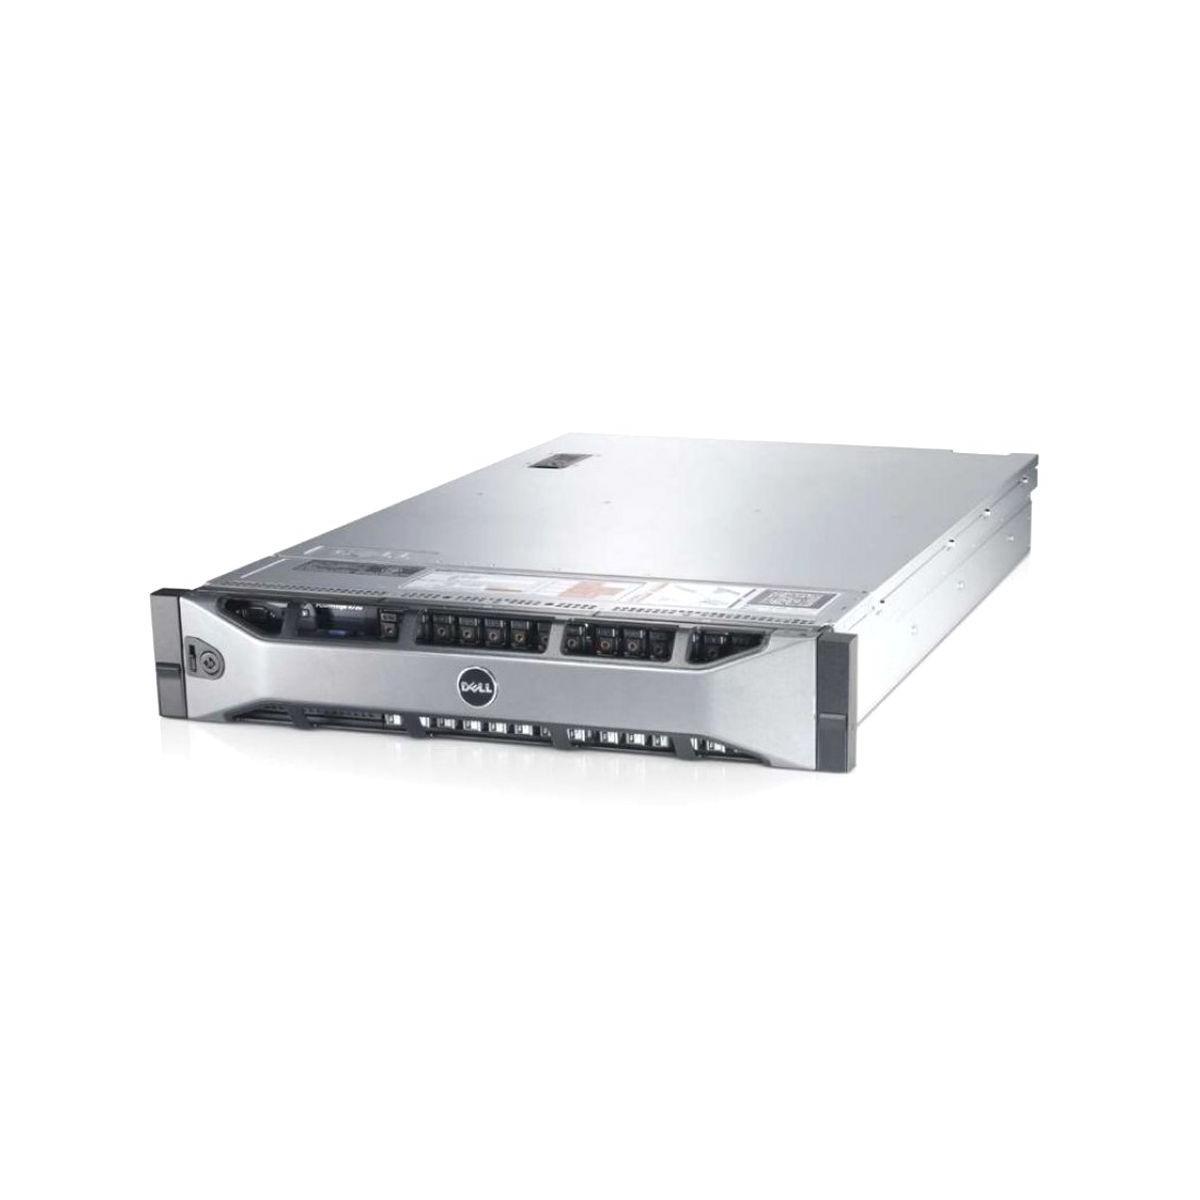 KIESZEN RAMKA 2,5'' IBM M1 x366,x3950,x3550,x3250